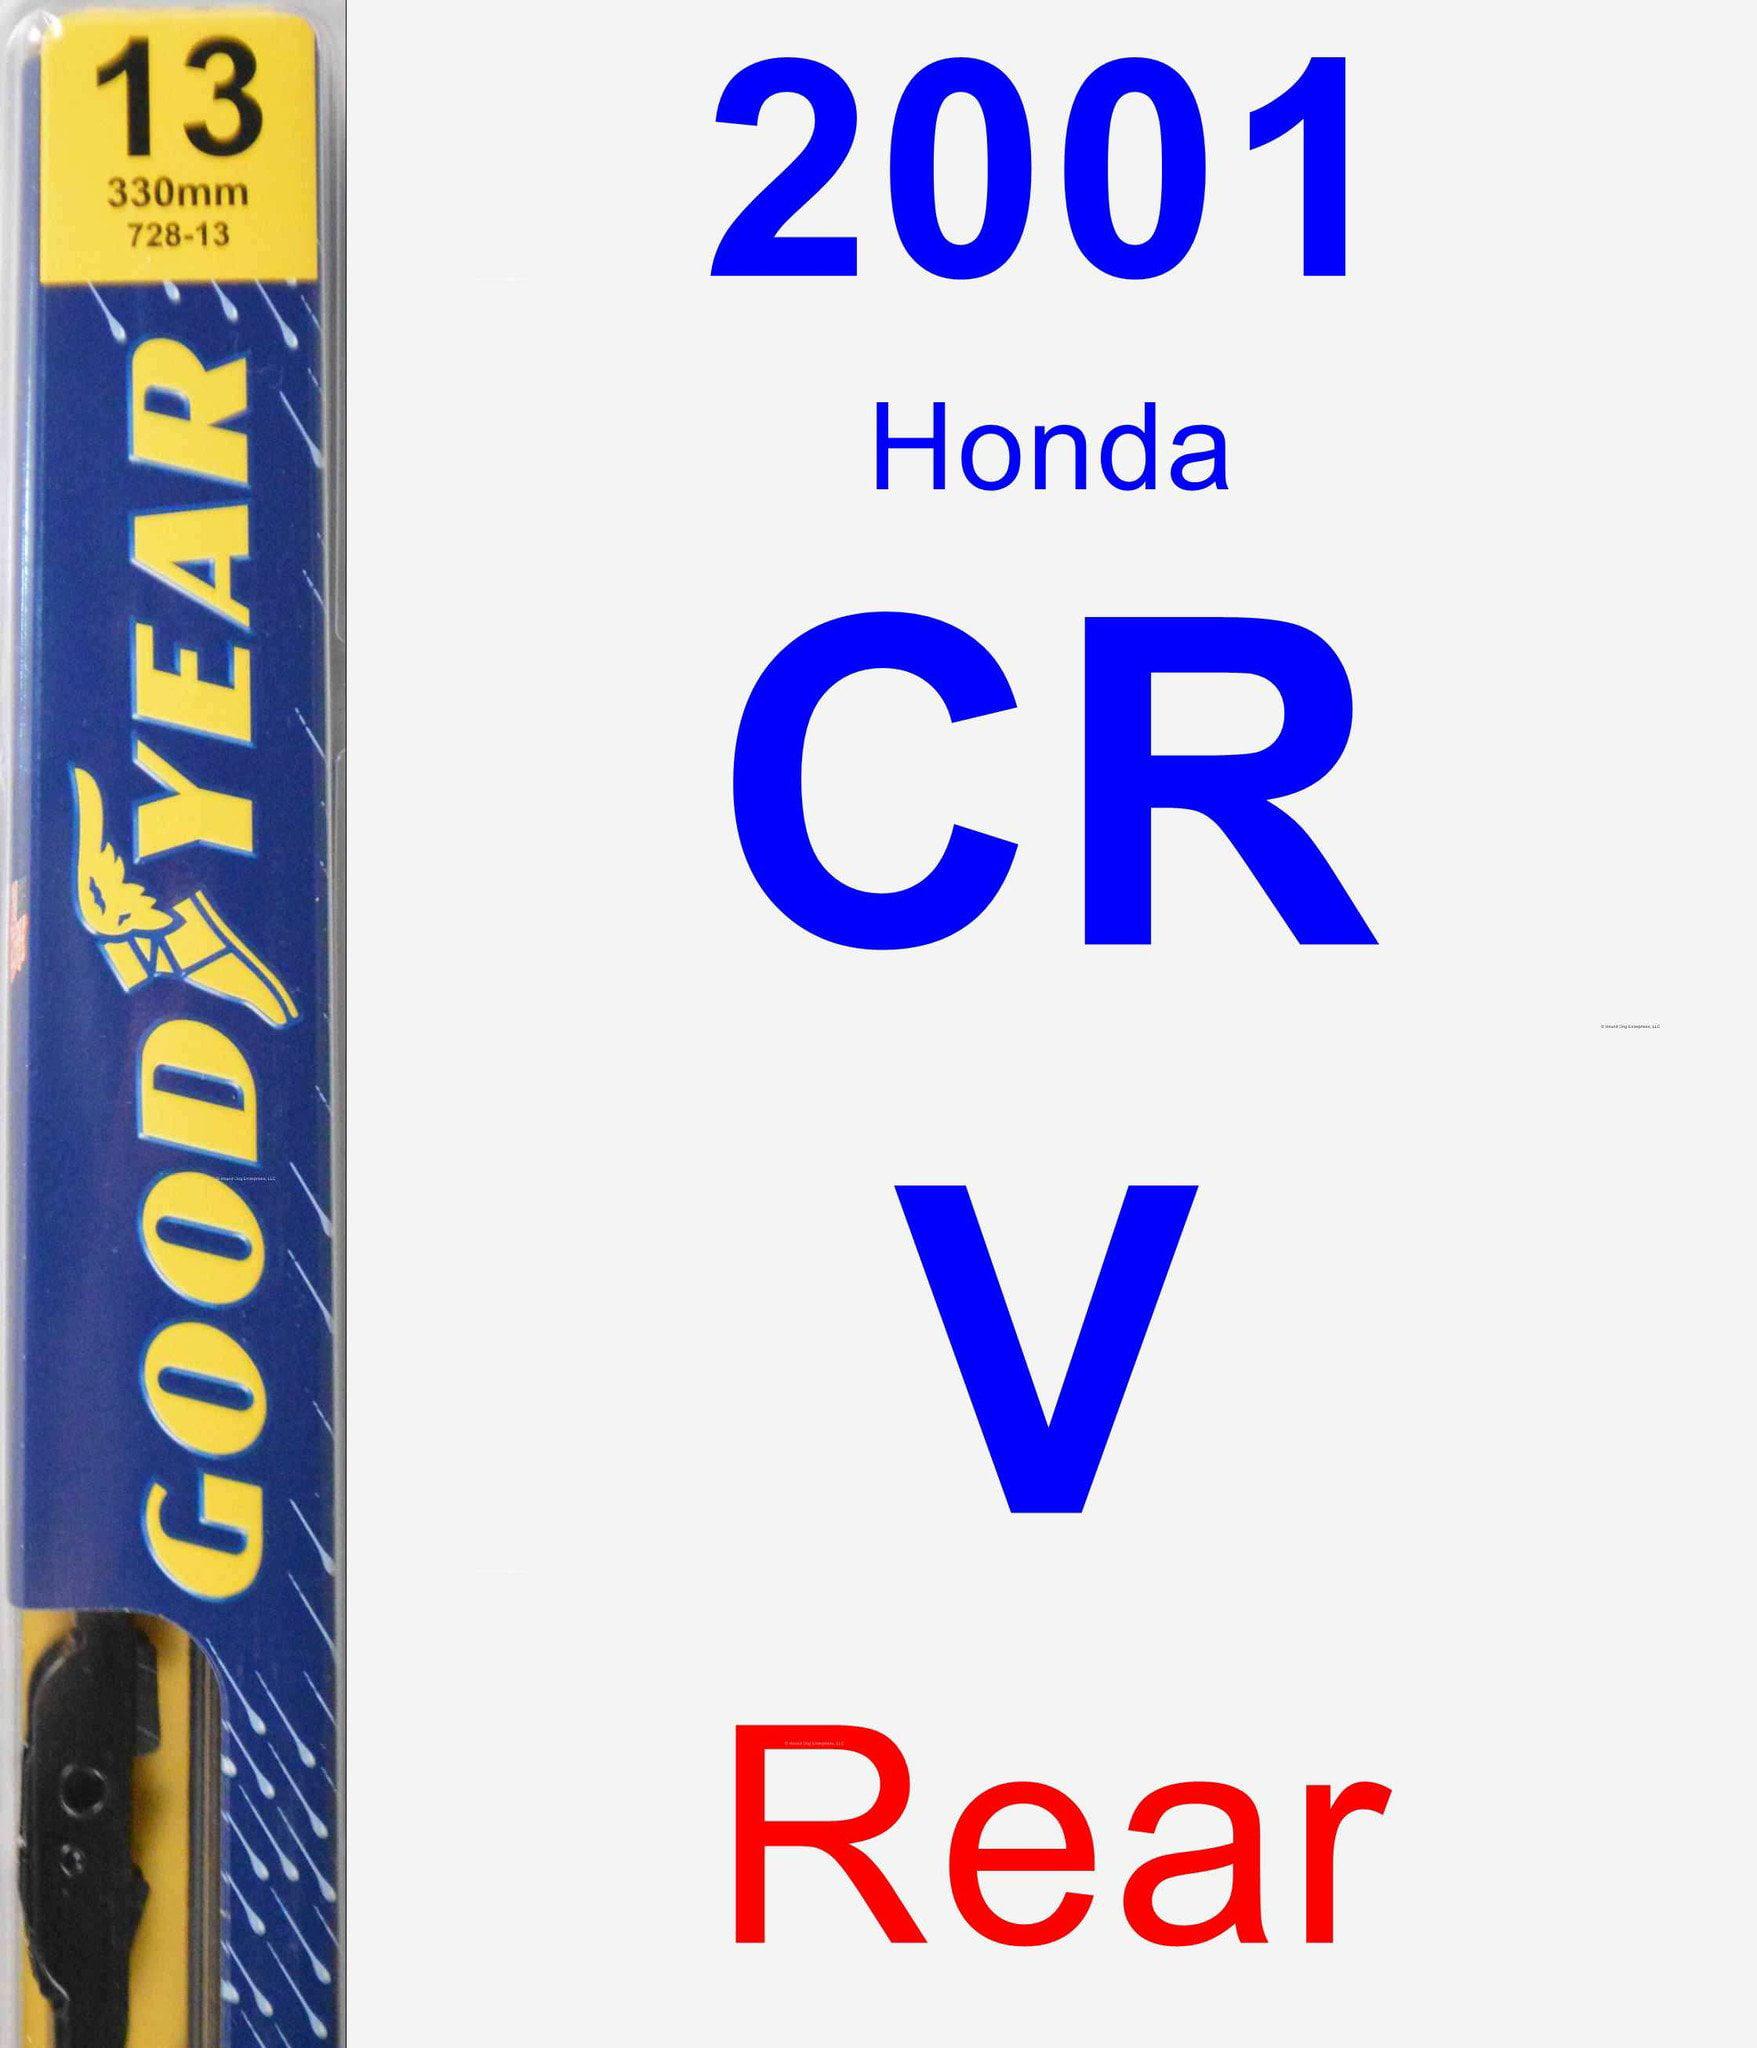 Design For Honda CRV 2001-2006 FRONT AND REAR WINDSCREEN WIPER BLADES